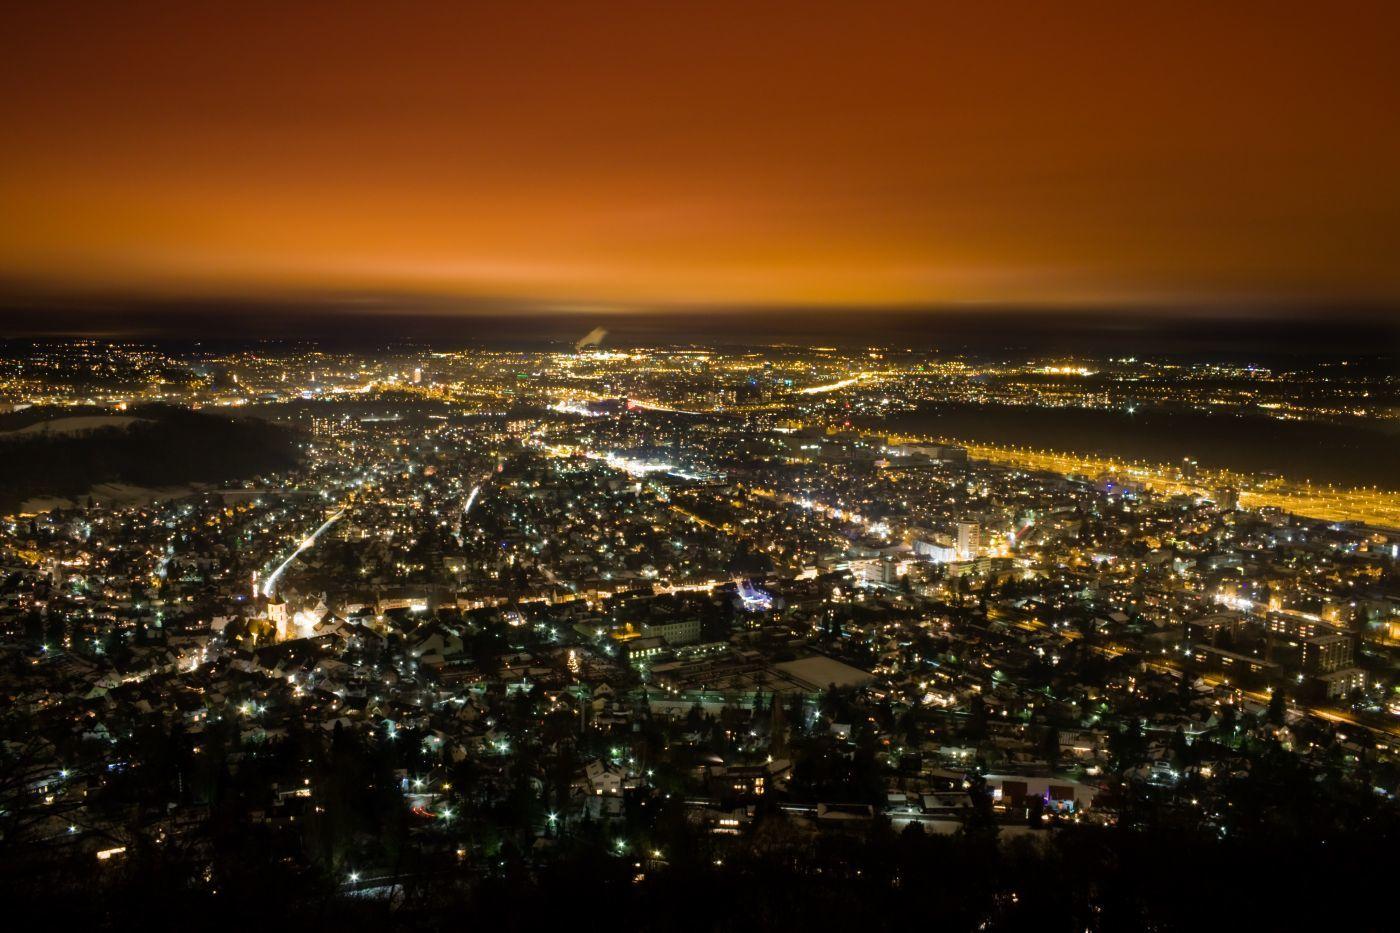 night view to Muttenz